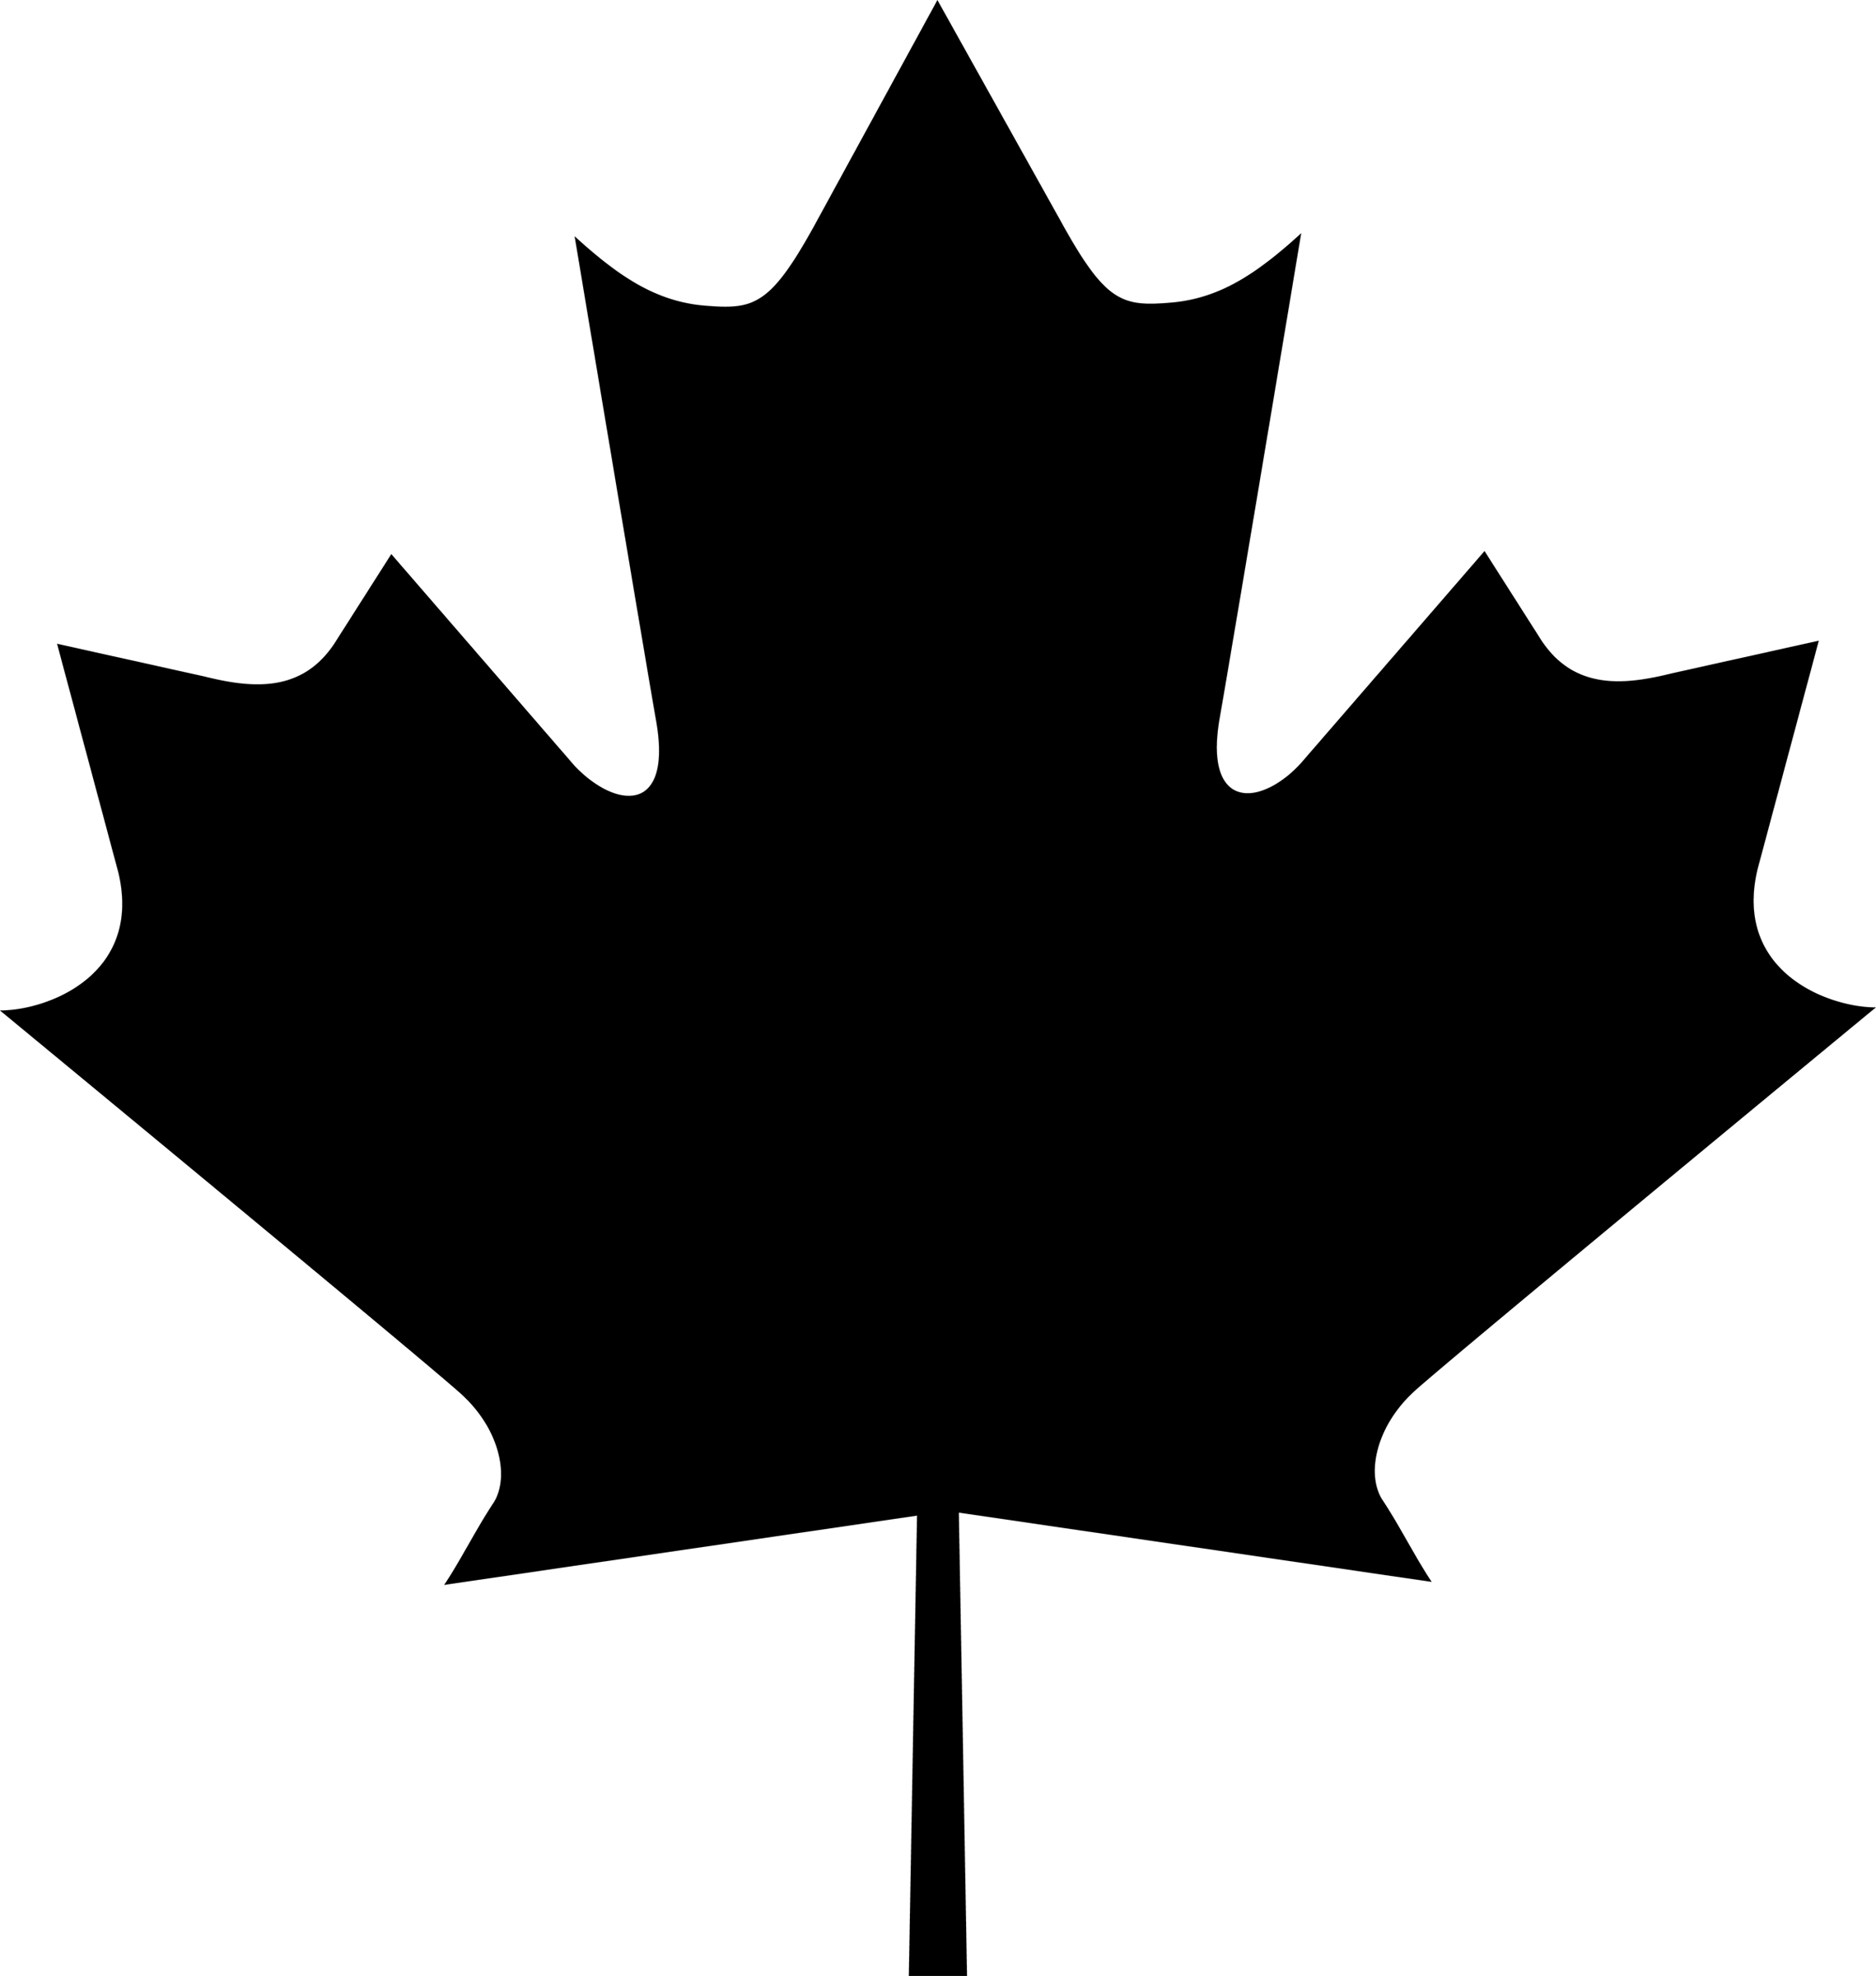 Maple Leaf Go Canada Clip Art-Maple Leaf Go Canada Clip Art-3